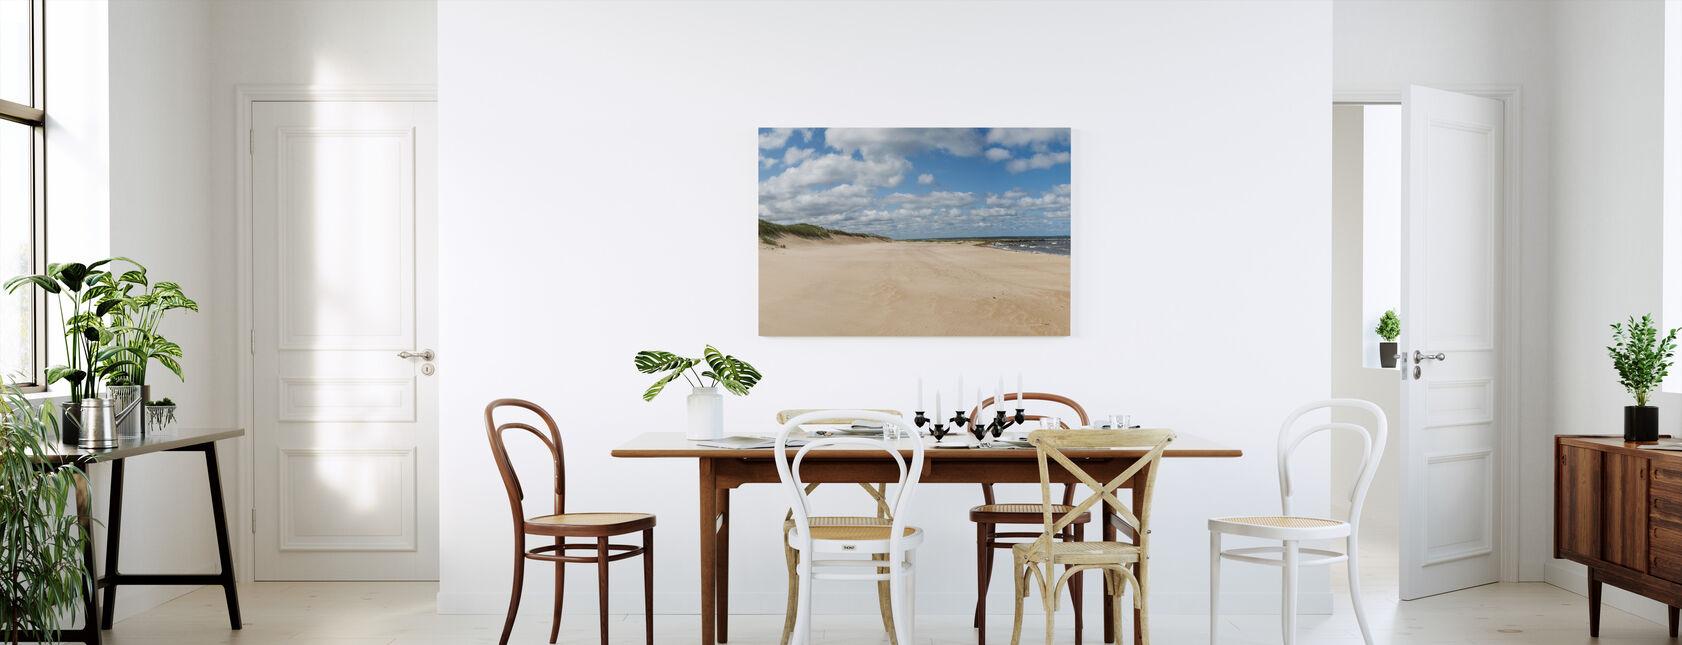 Vejbystrand in Skåne, Sweden - Canvas print - Kitchen